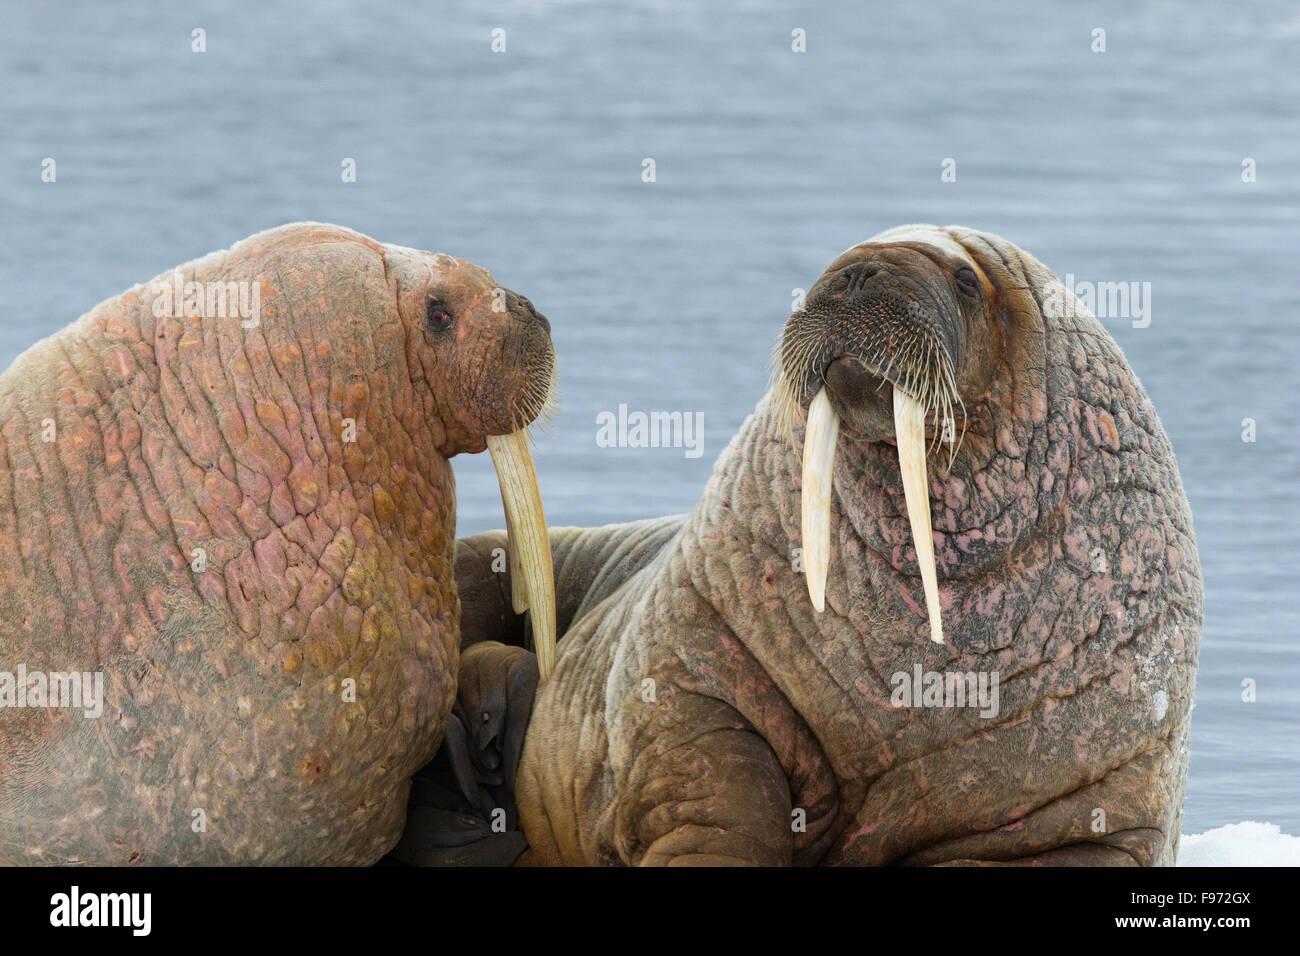 Atlantic walruses (Odobenus rosmarus rosmarus), resting on ice floe, Svalbard Archipelago, Arctic Norway. - Stock Image